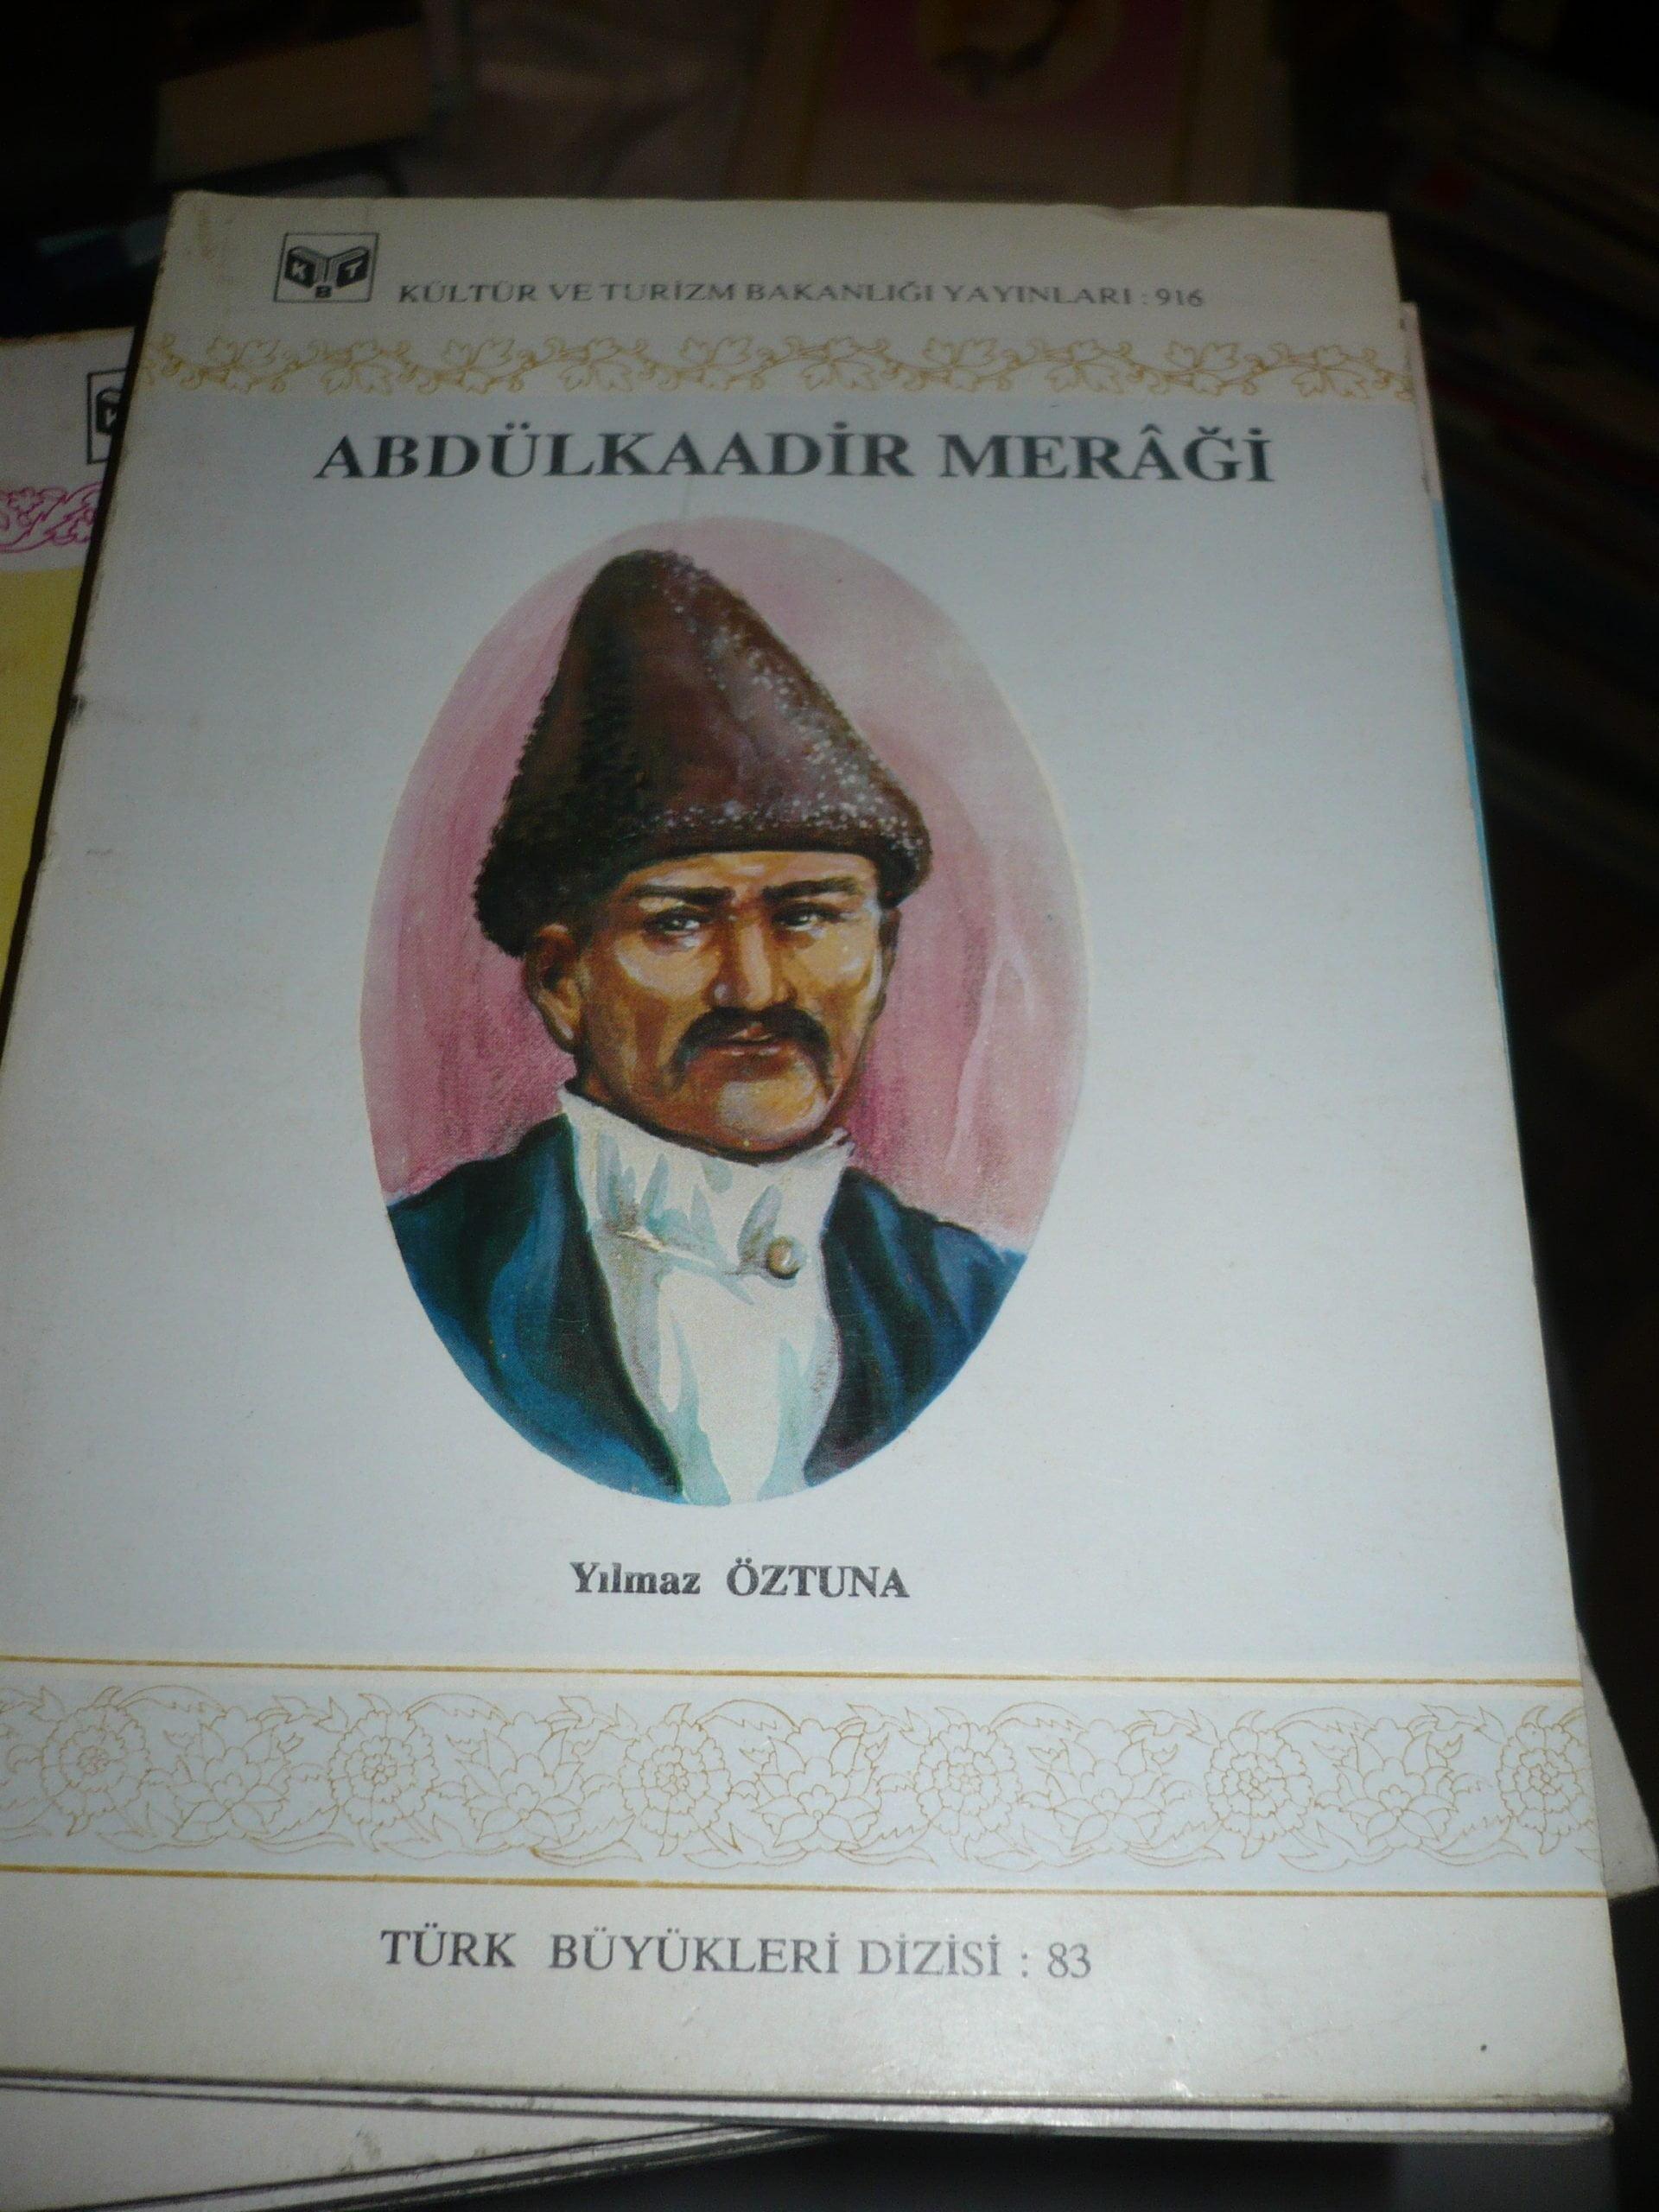 Abdulkaadir Meragi/Yılmaz Öztuna/ 10tl